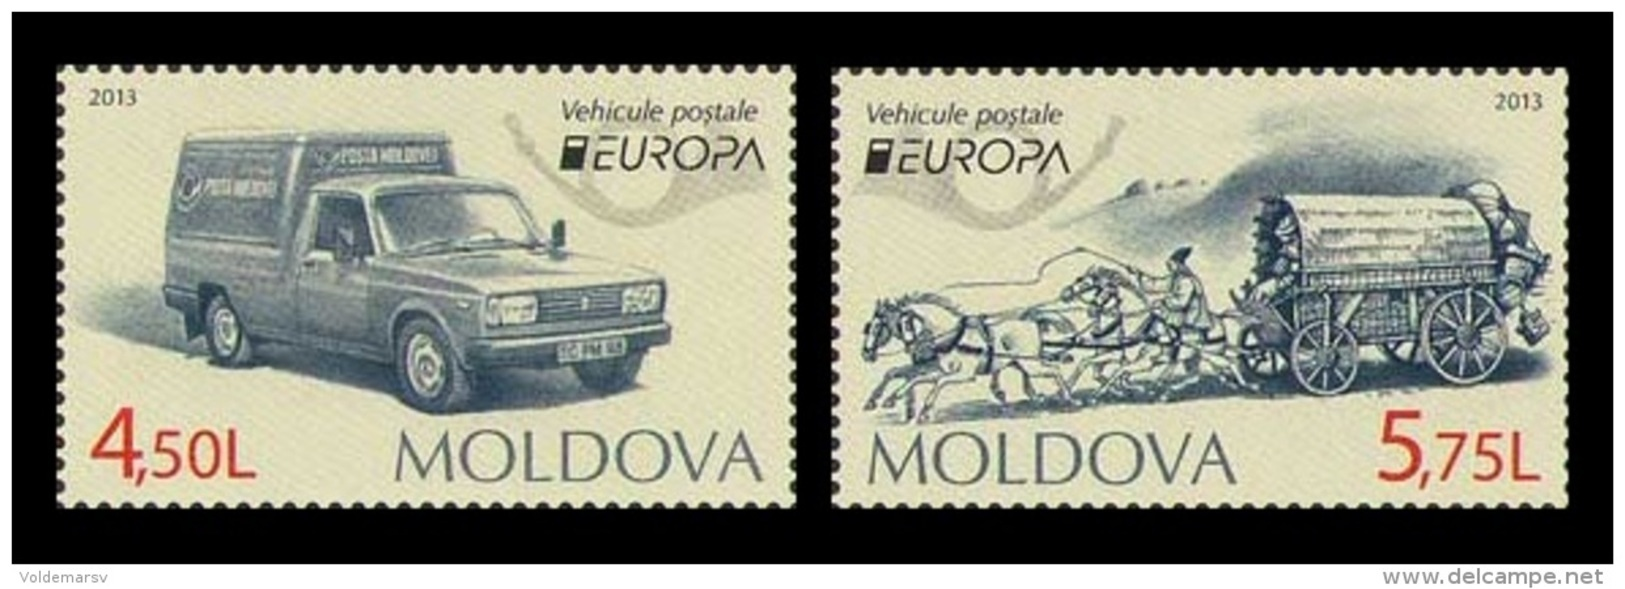 Moldova 2013 Mih. 829/30 Europa-Cept. Postal Means MNH ** - Moldawien (Moldau)